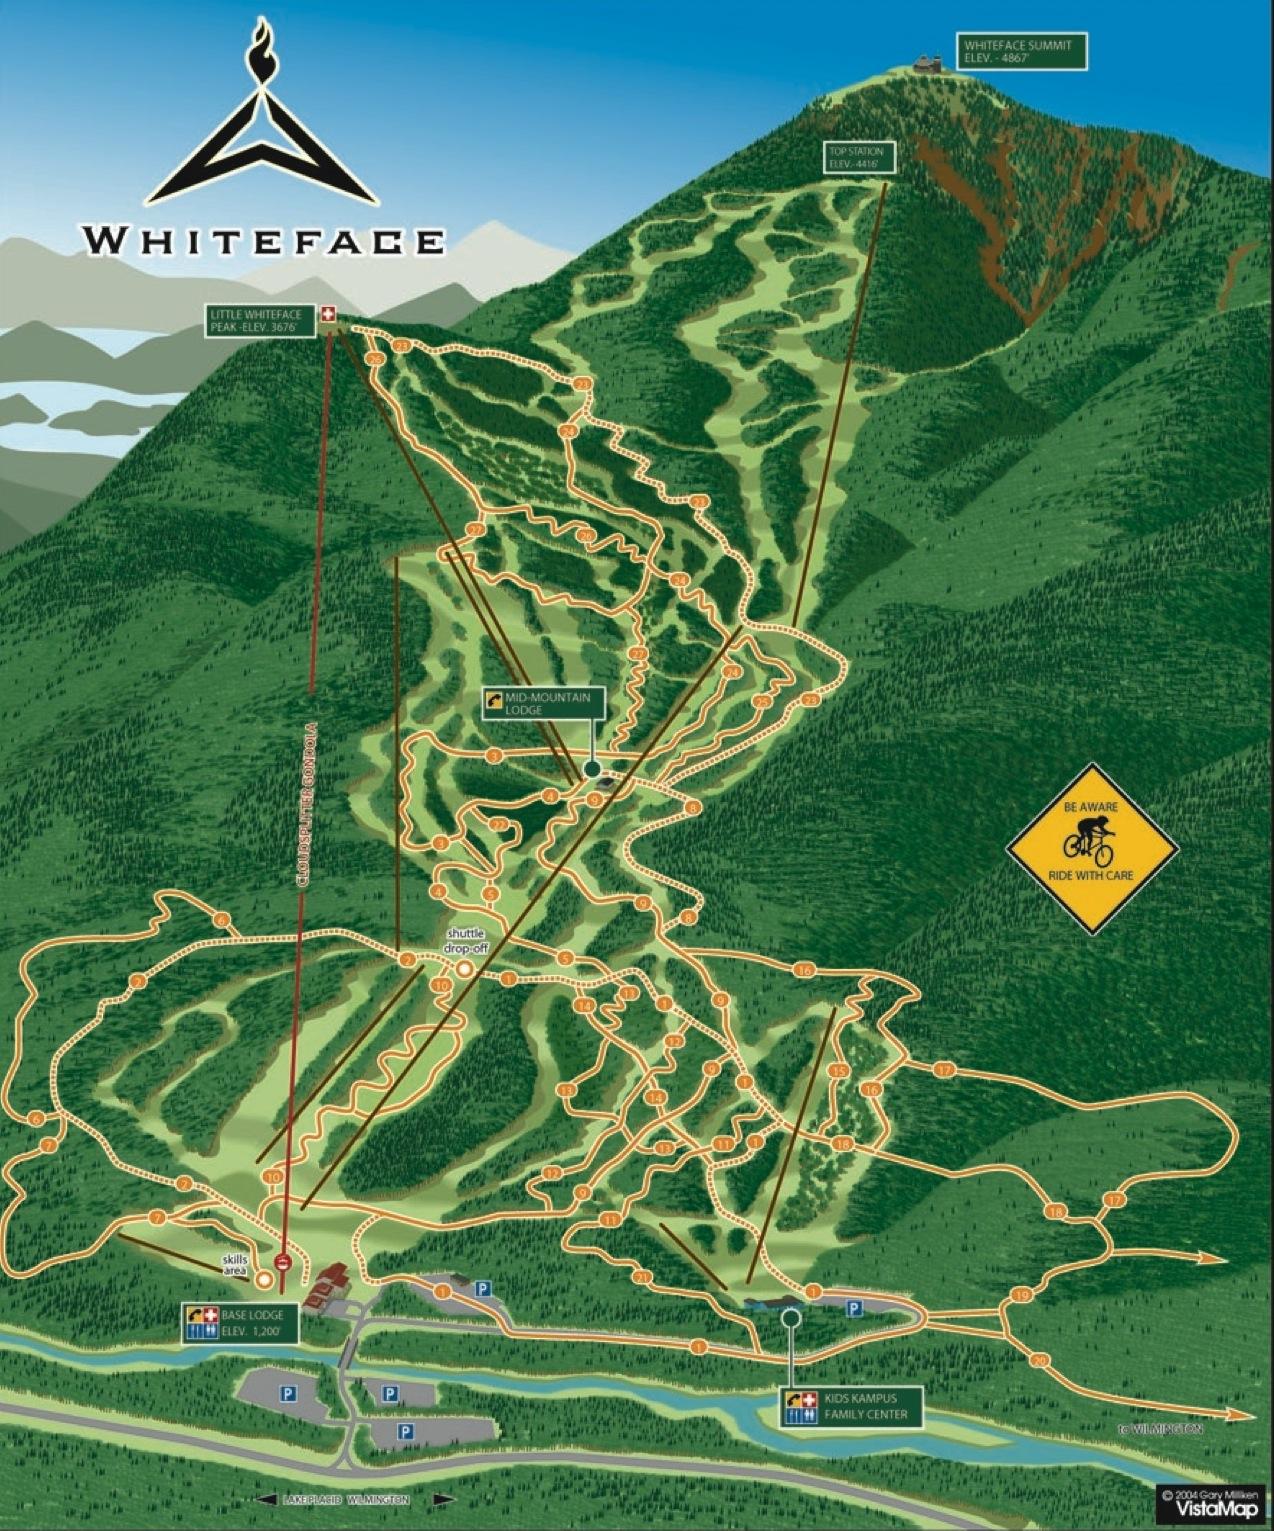 d8e0f91d37c Mountain Biking Returns to Whiteface - - The Adirondack Almanack